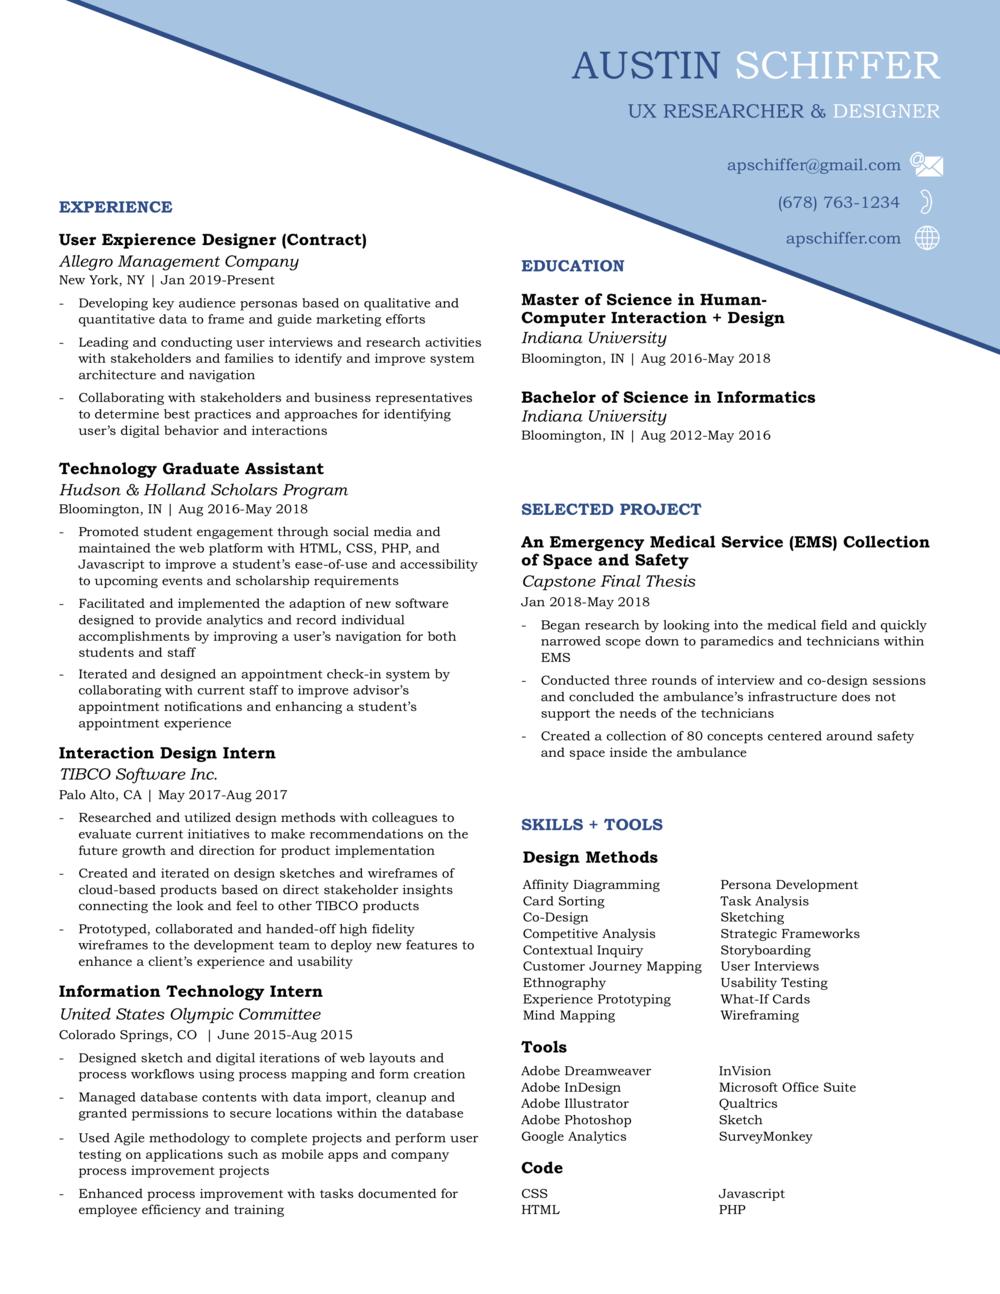 Schiffer Researcher&Designer Resume.png